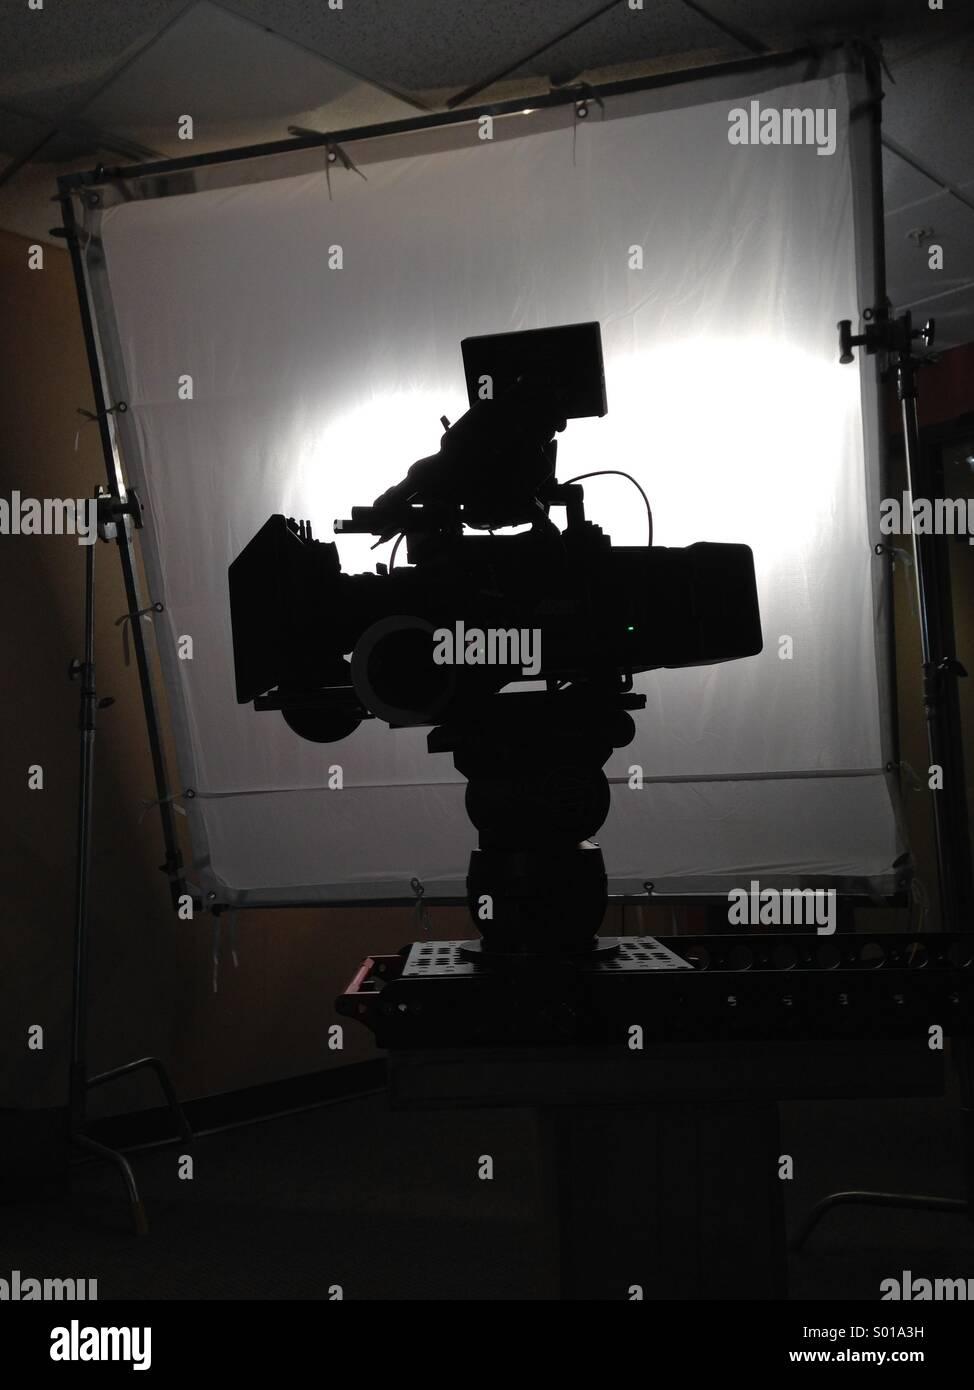 Digitale Filmkamera Produktion Silhouette vor Licht-equipment Stockbild